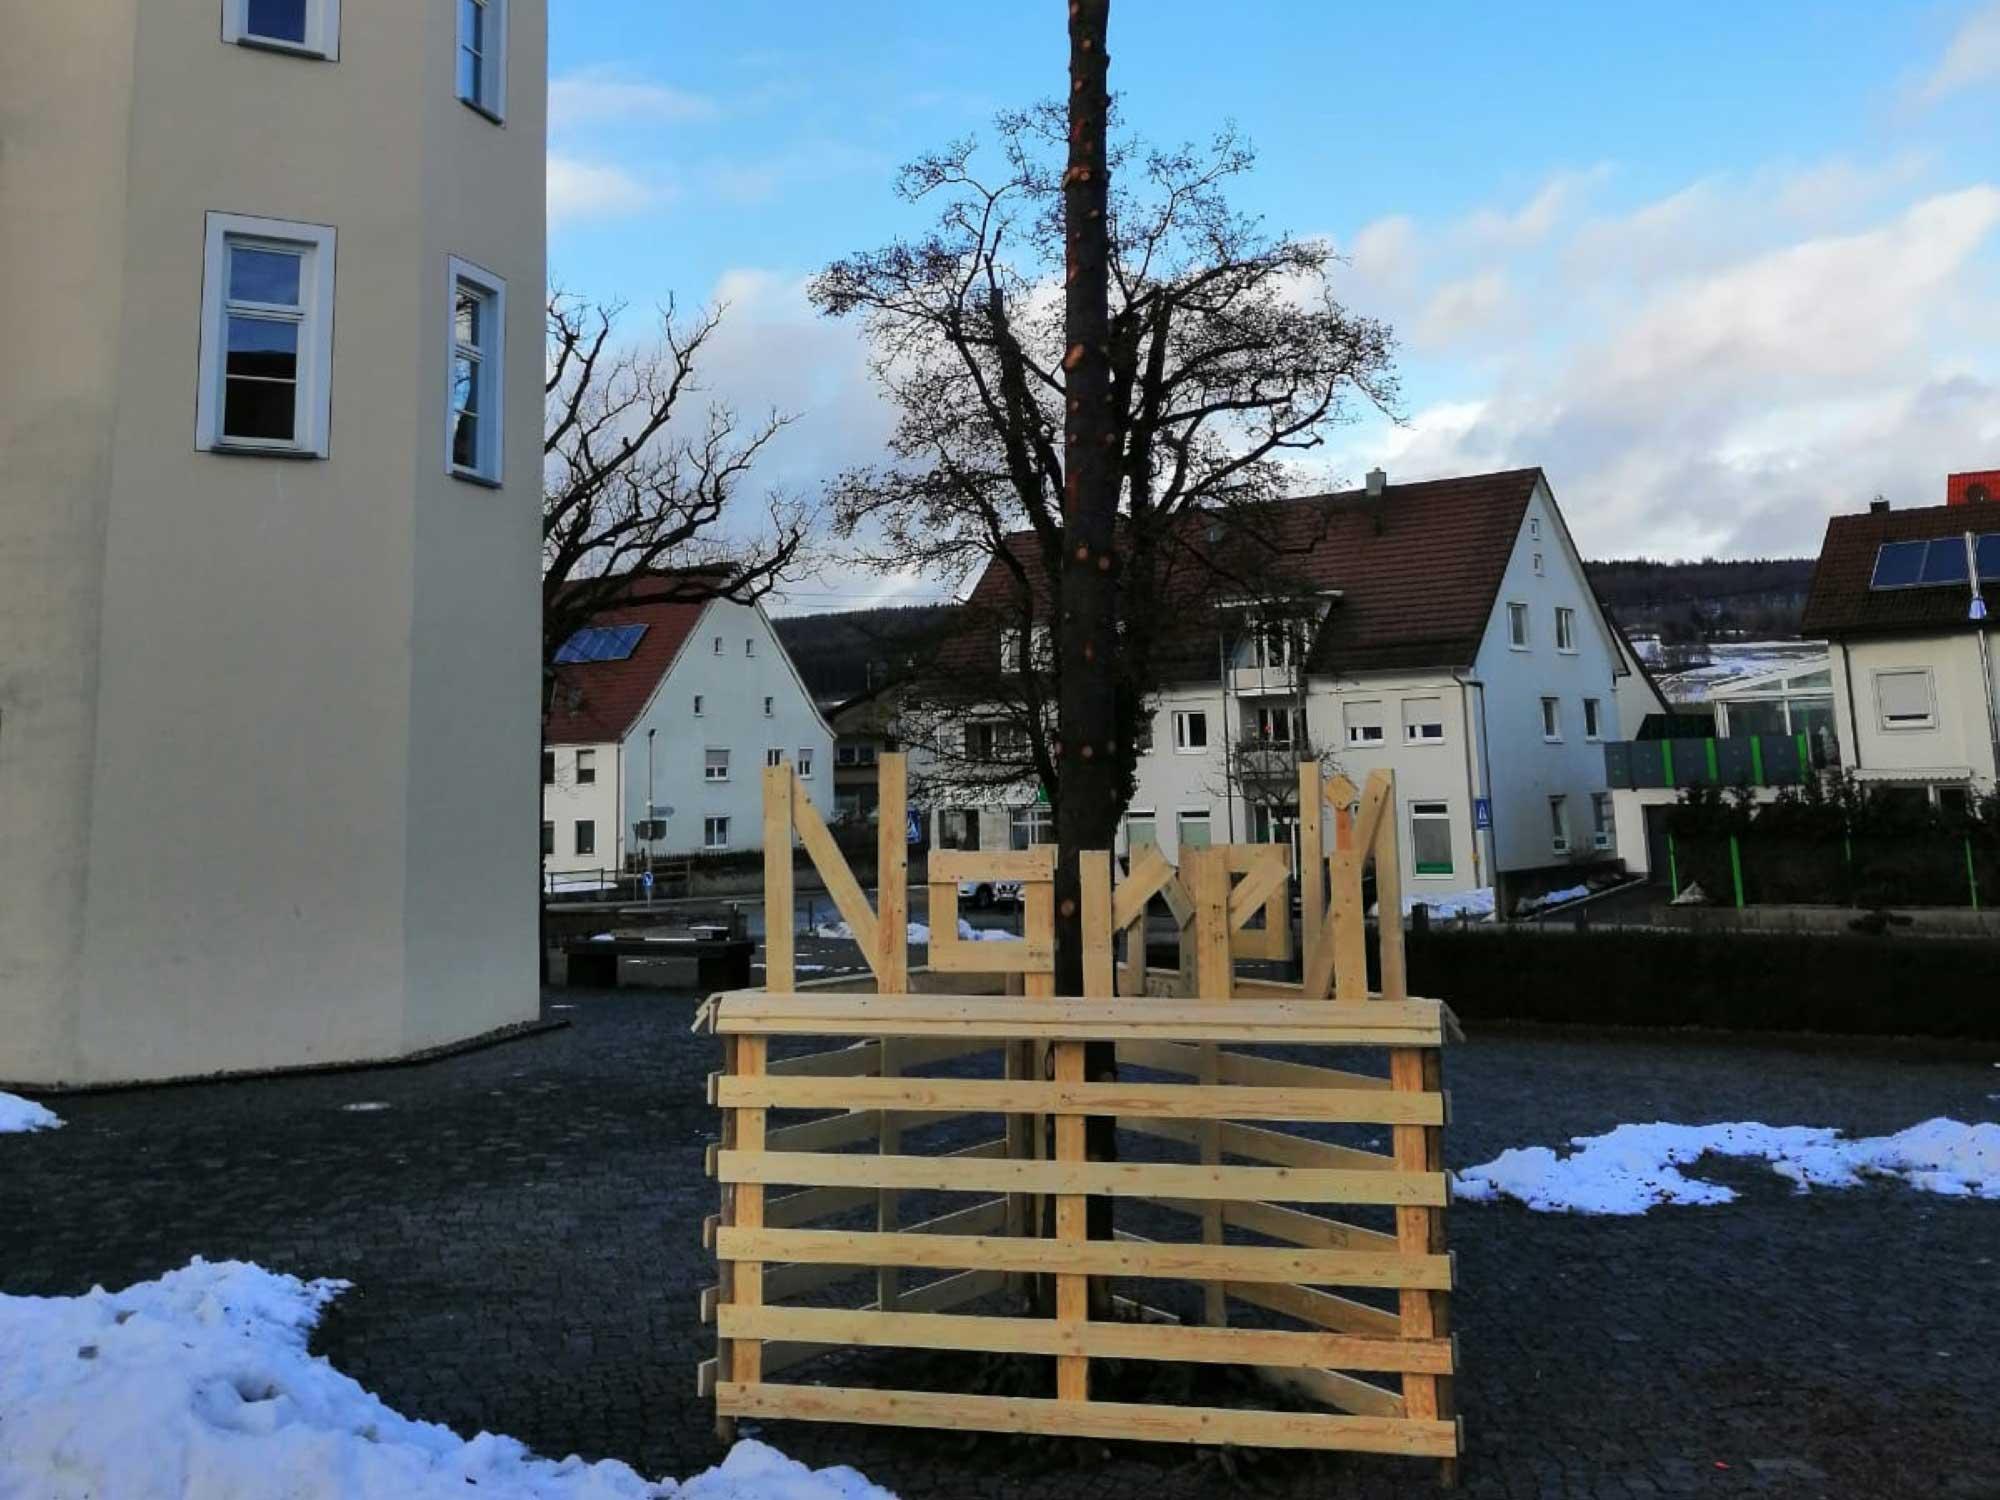 Narrenzaun-Narrenverein-Langenenslingen